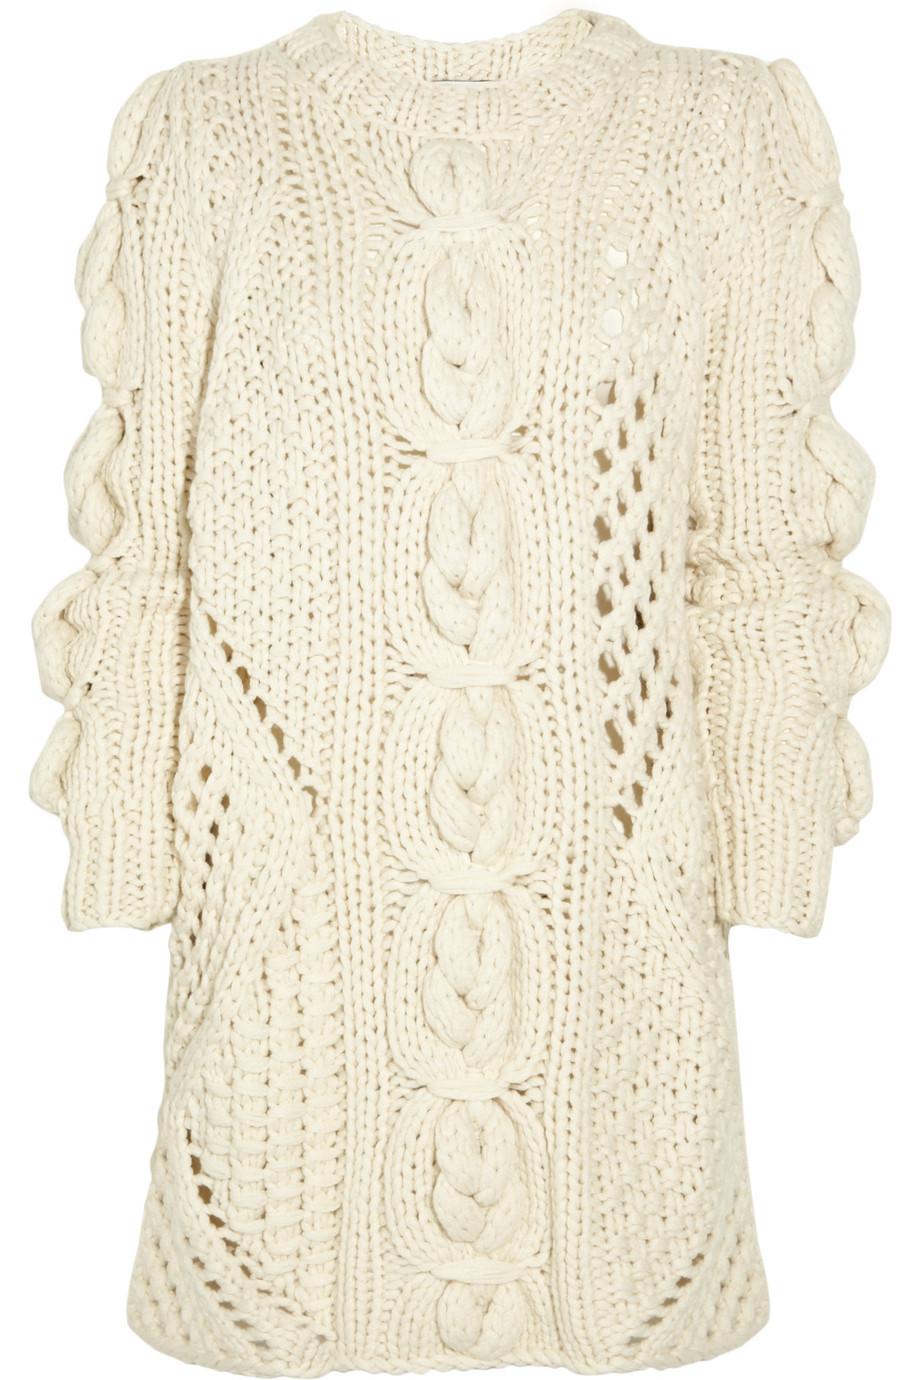 Pringle of scotland Aran-knit Cashmere Sweater Dress in ...